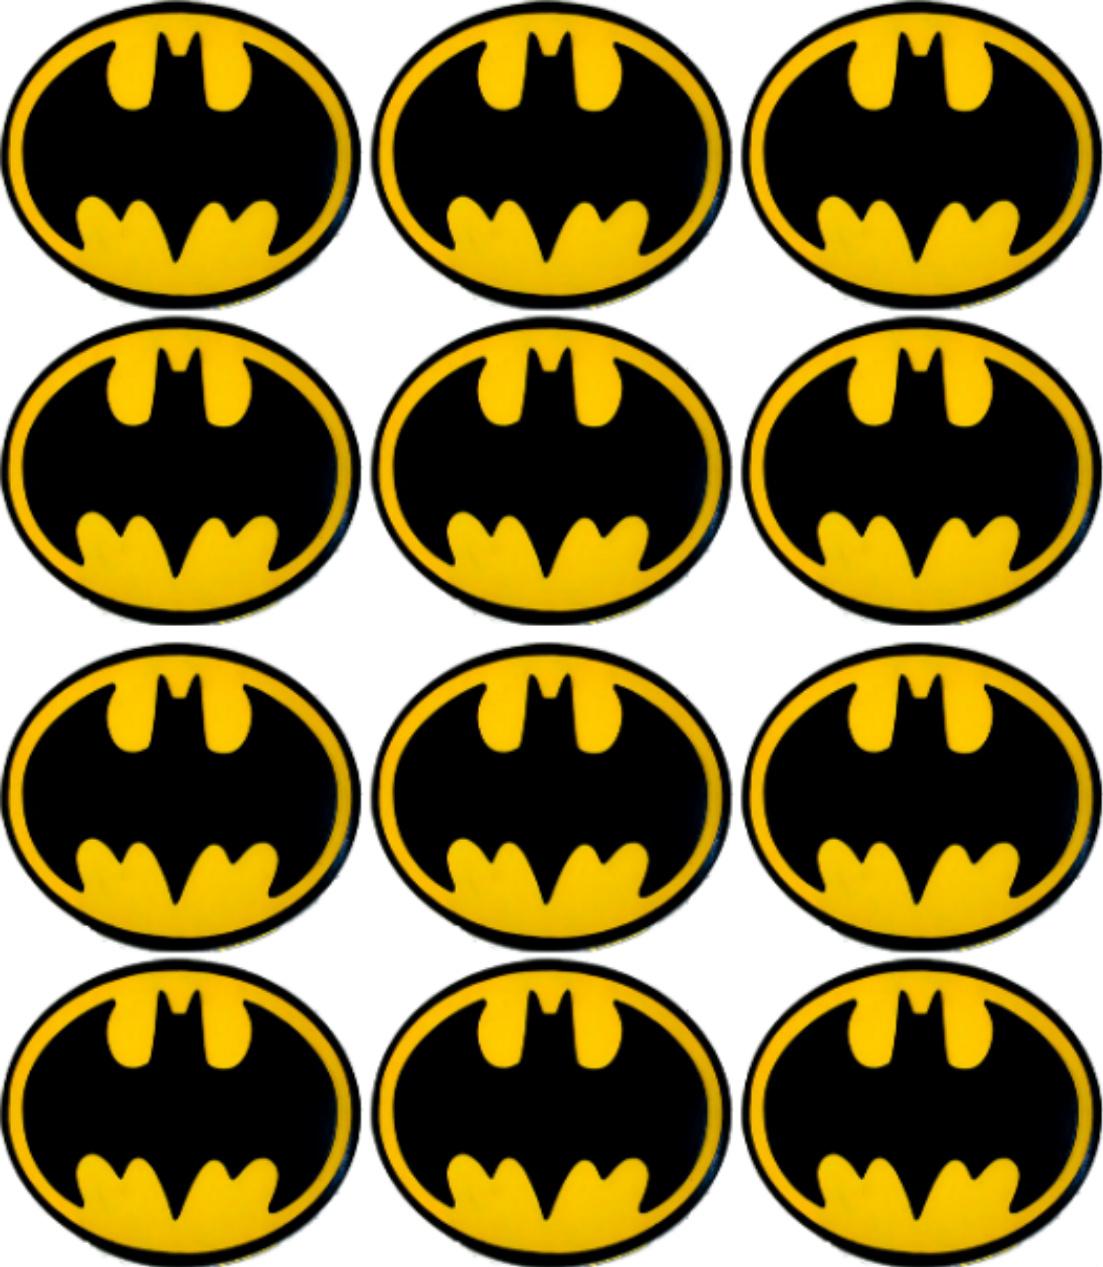 Imagenes De Batman Para Imprimir - ARCHIDEV